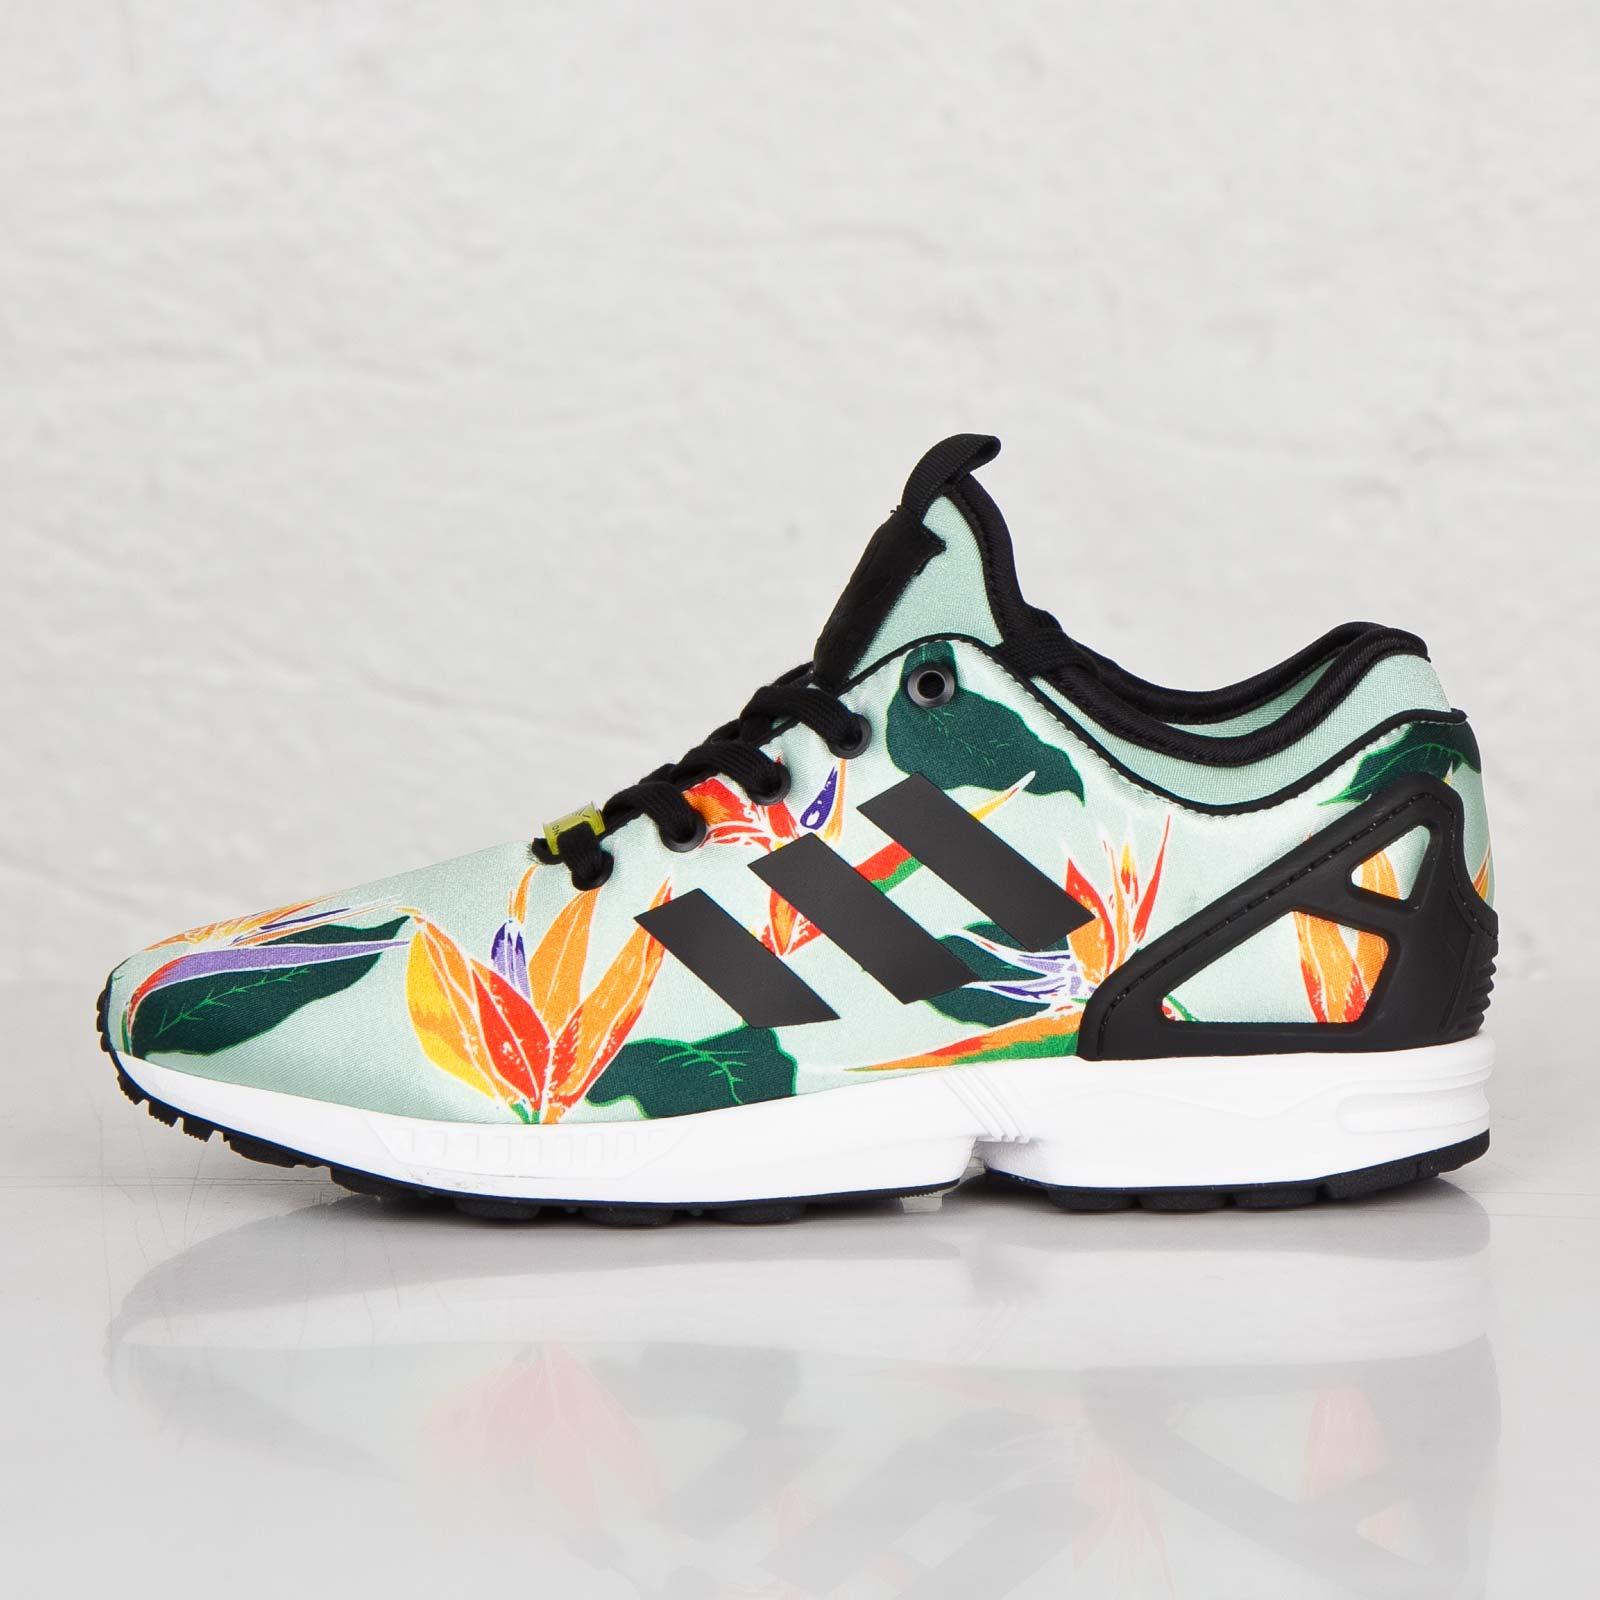 new styles 5c125 52c65 ... promo code for adidas zx flux nps 98de4 2311c